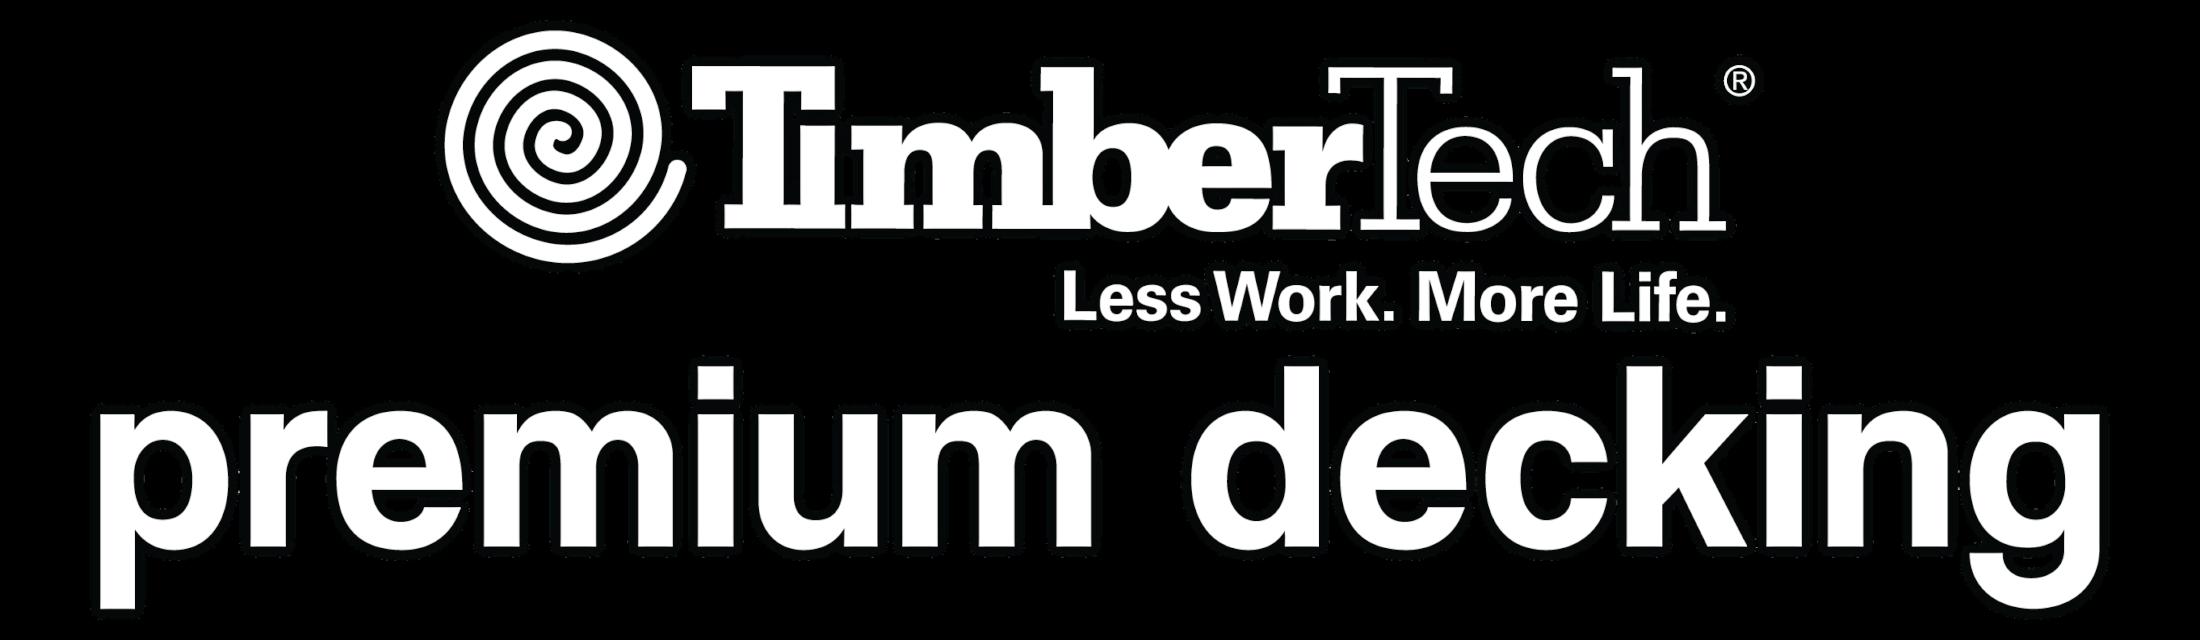 timbertech landing page header